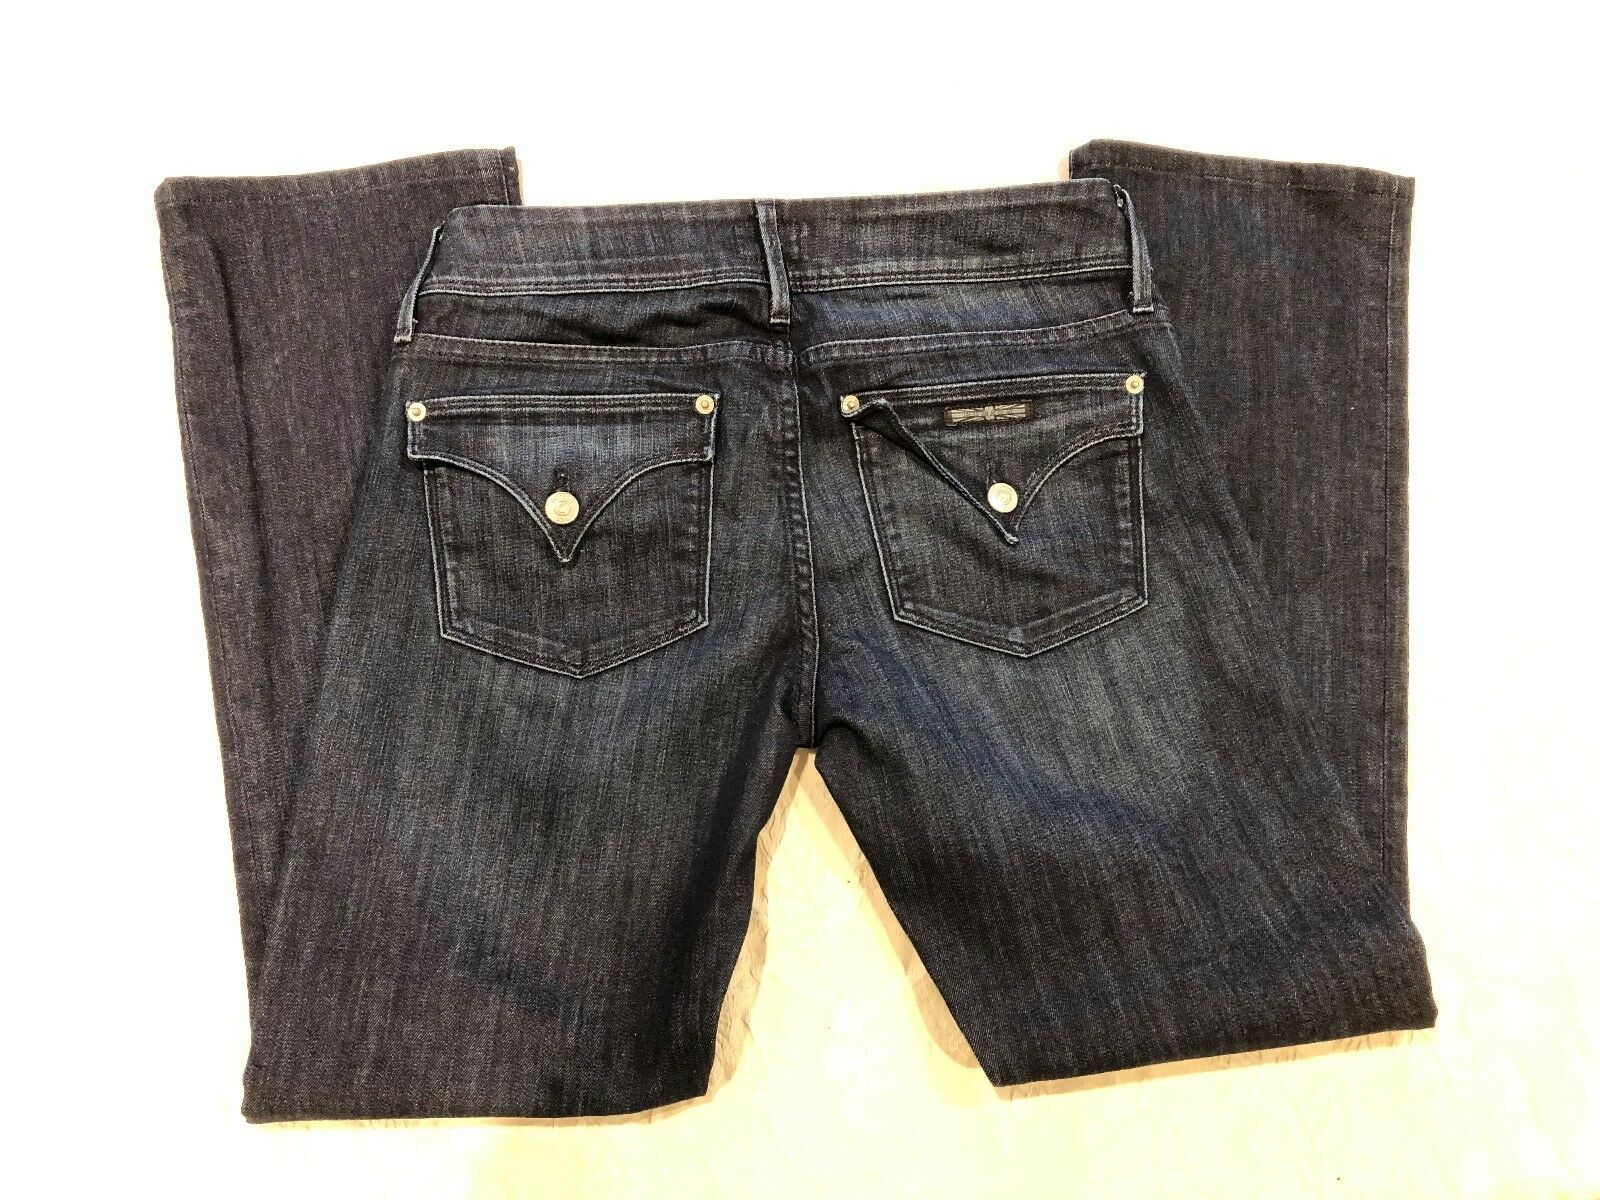 290cbec6741340 NEW HUDSON Jeans 'Baby Stiefel' 16 Leg Opening Stiefelcut Jeans, 29 - Medium